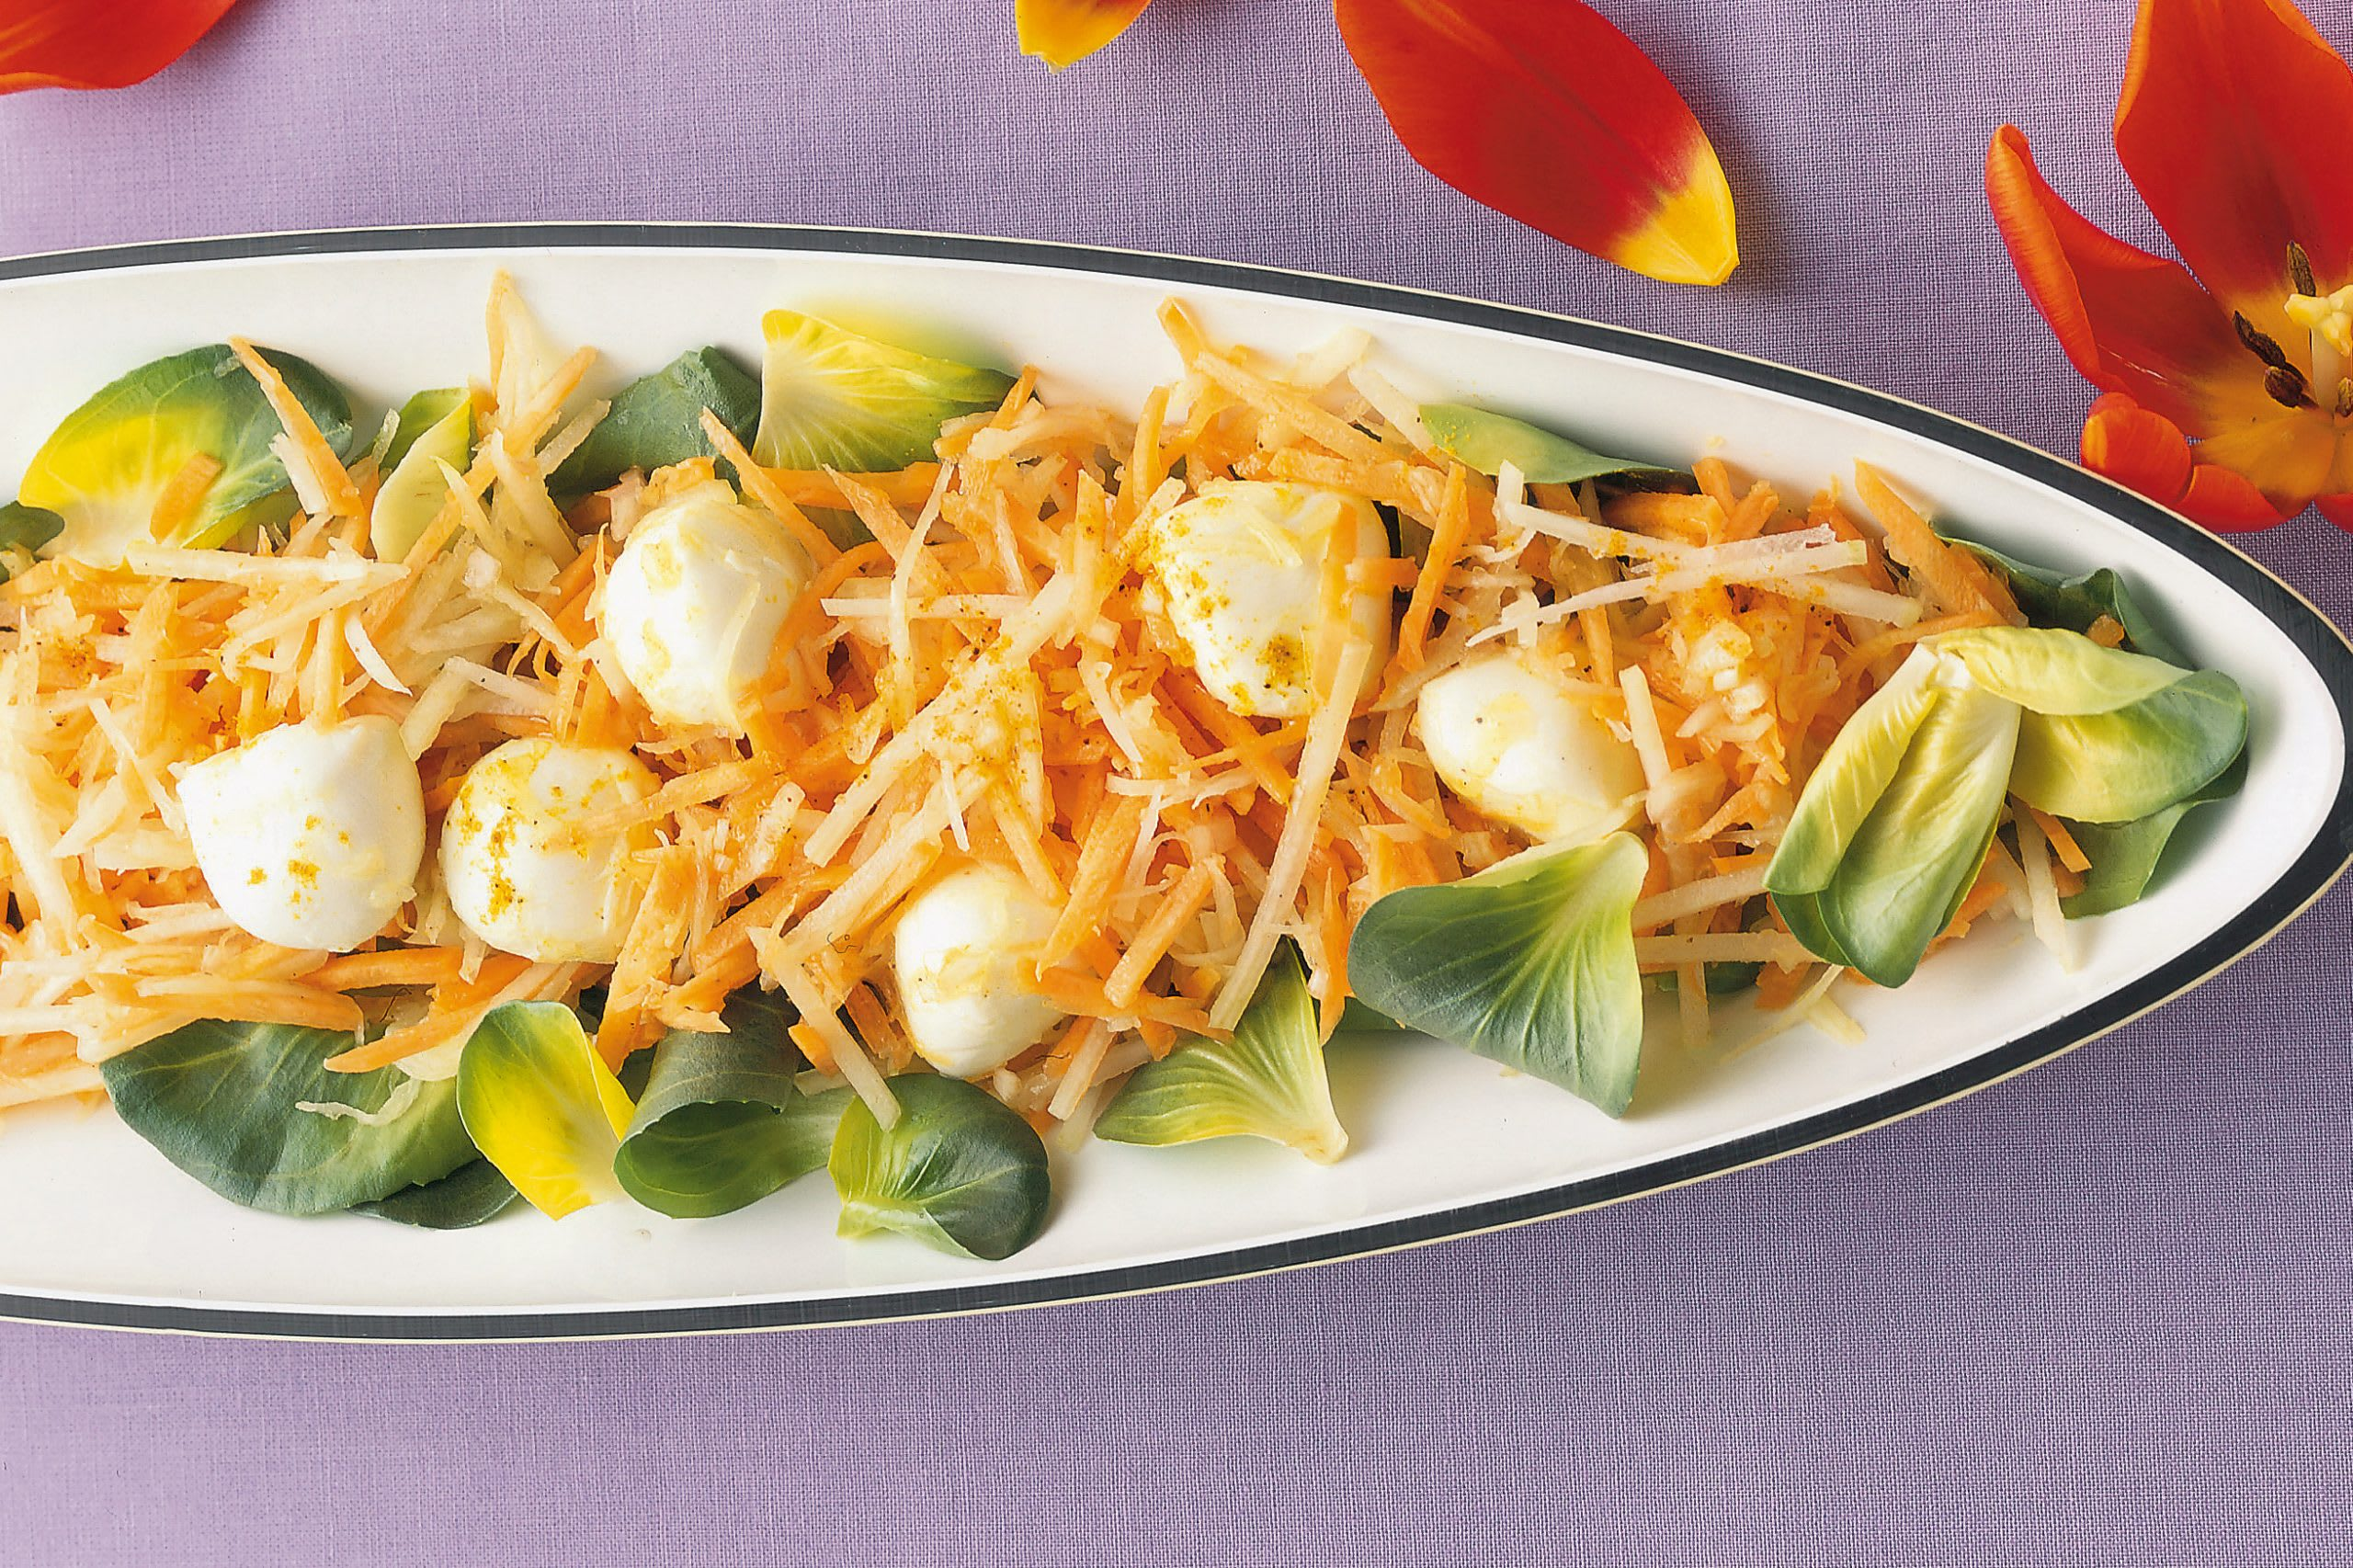 Süss-saurer Kohlrabi-Rüebli-Salat mit Mozzarella